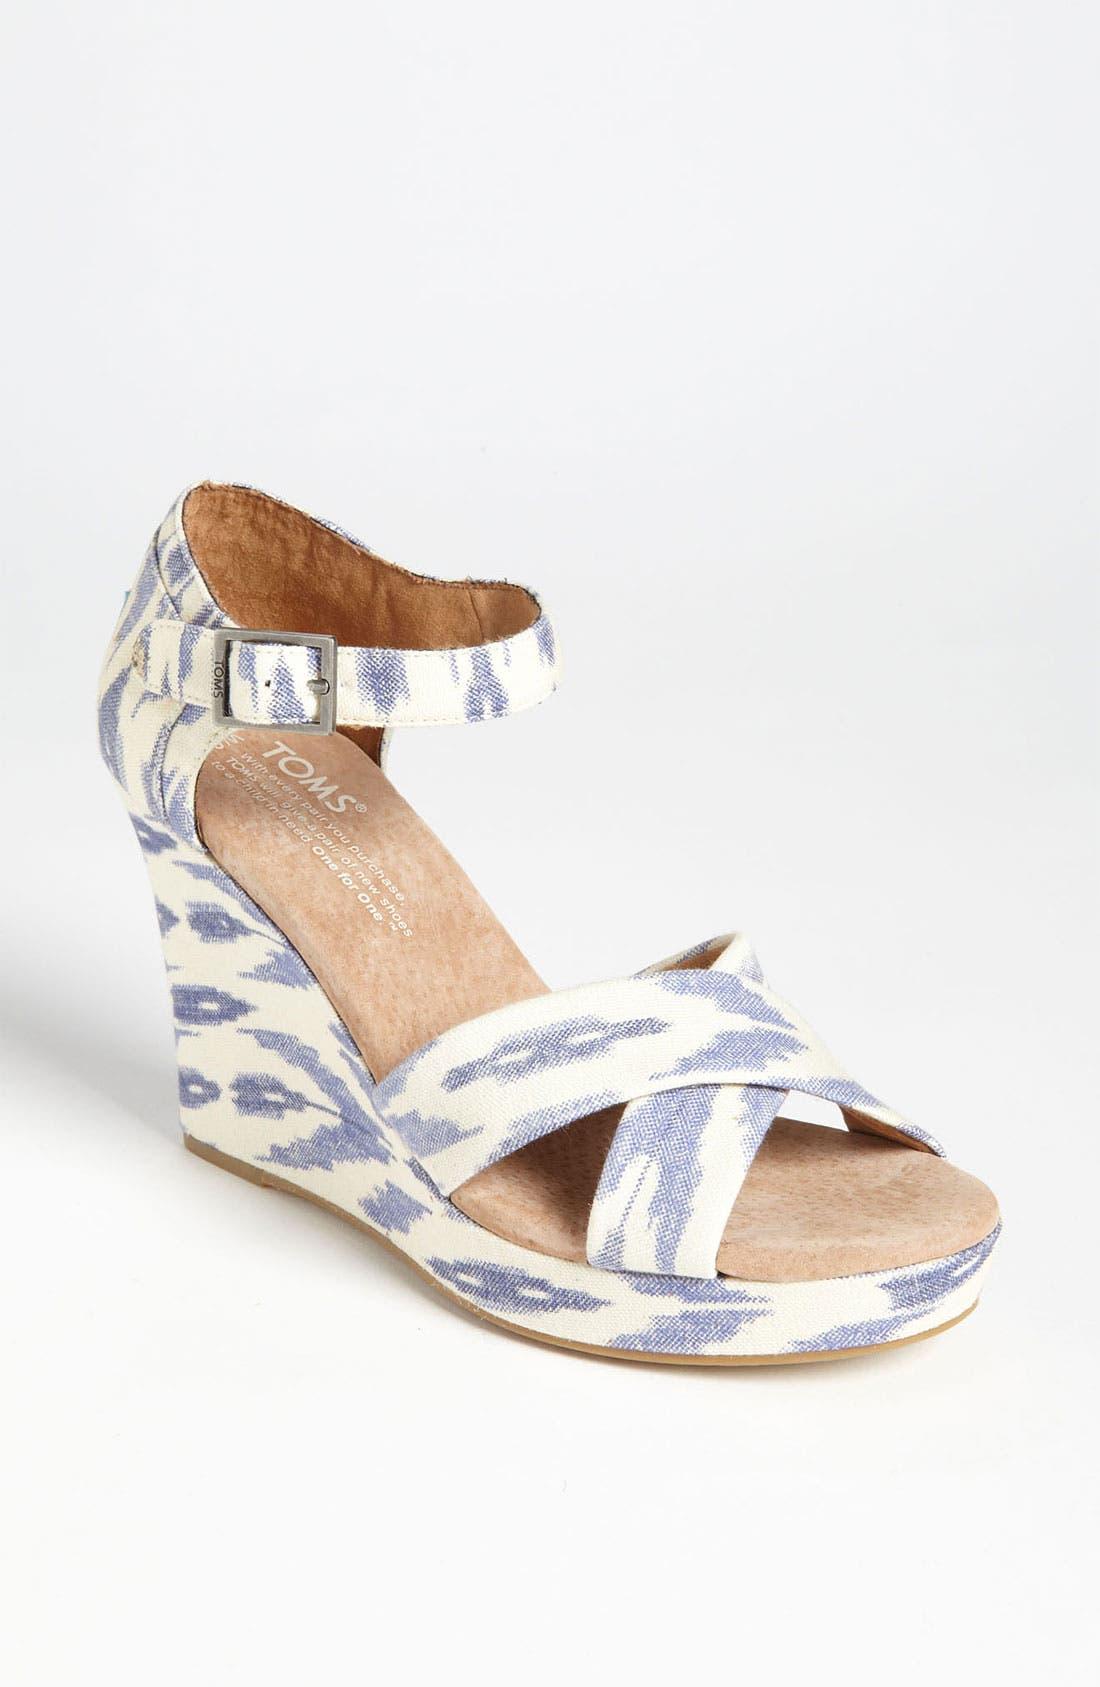 Main Image - TOMS 'Ikat' Wedge Sandal